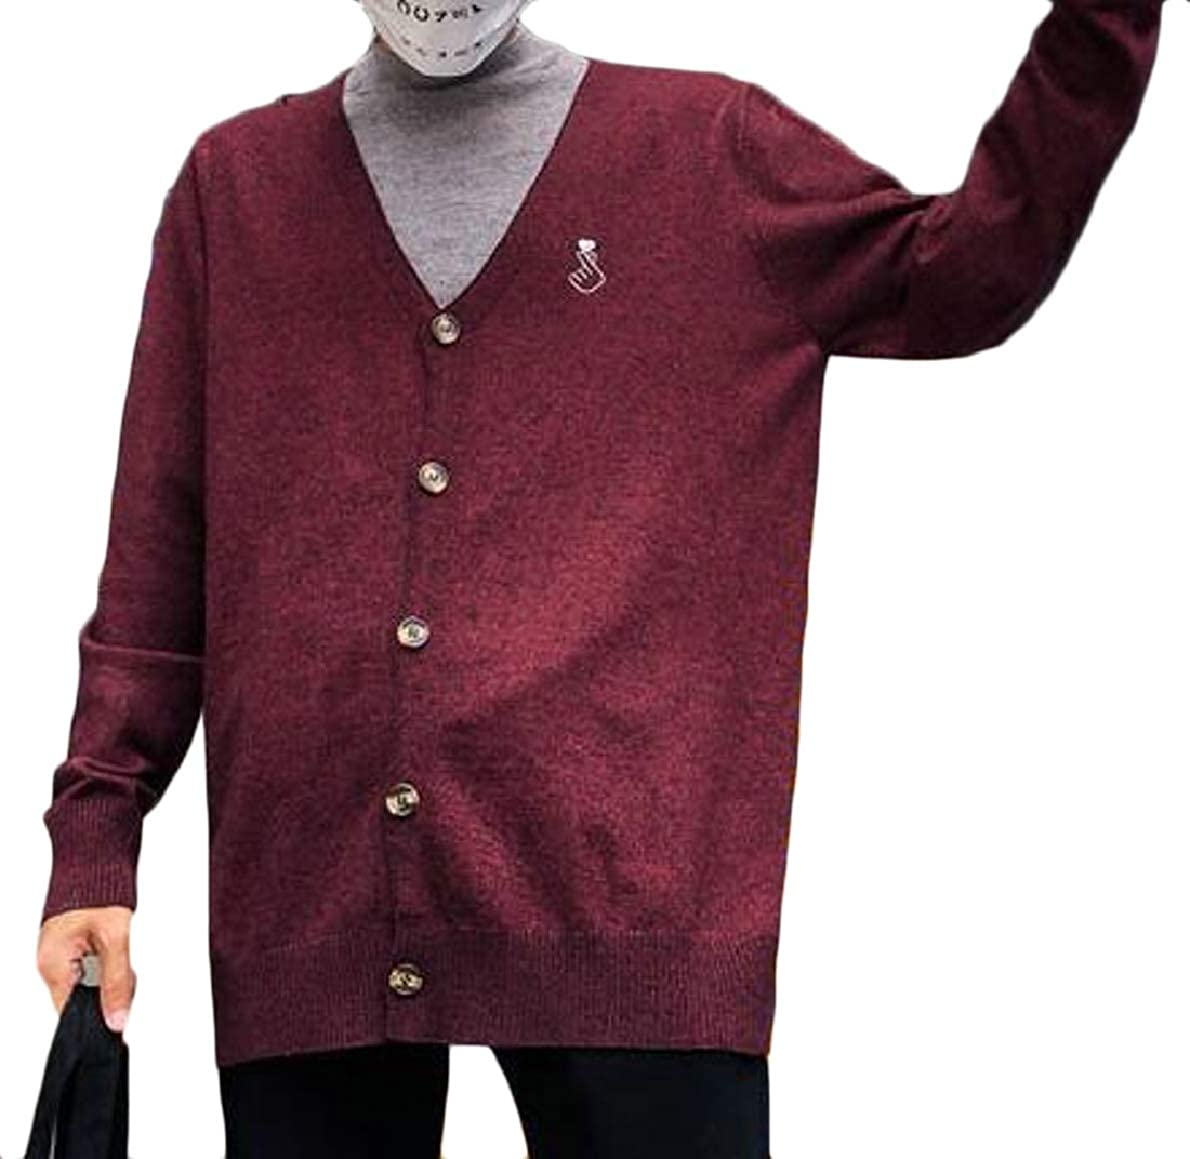 FLCH+YIGE Men V-Neck Long Sleeve Button Up Cardigan Knitwear